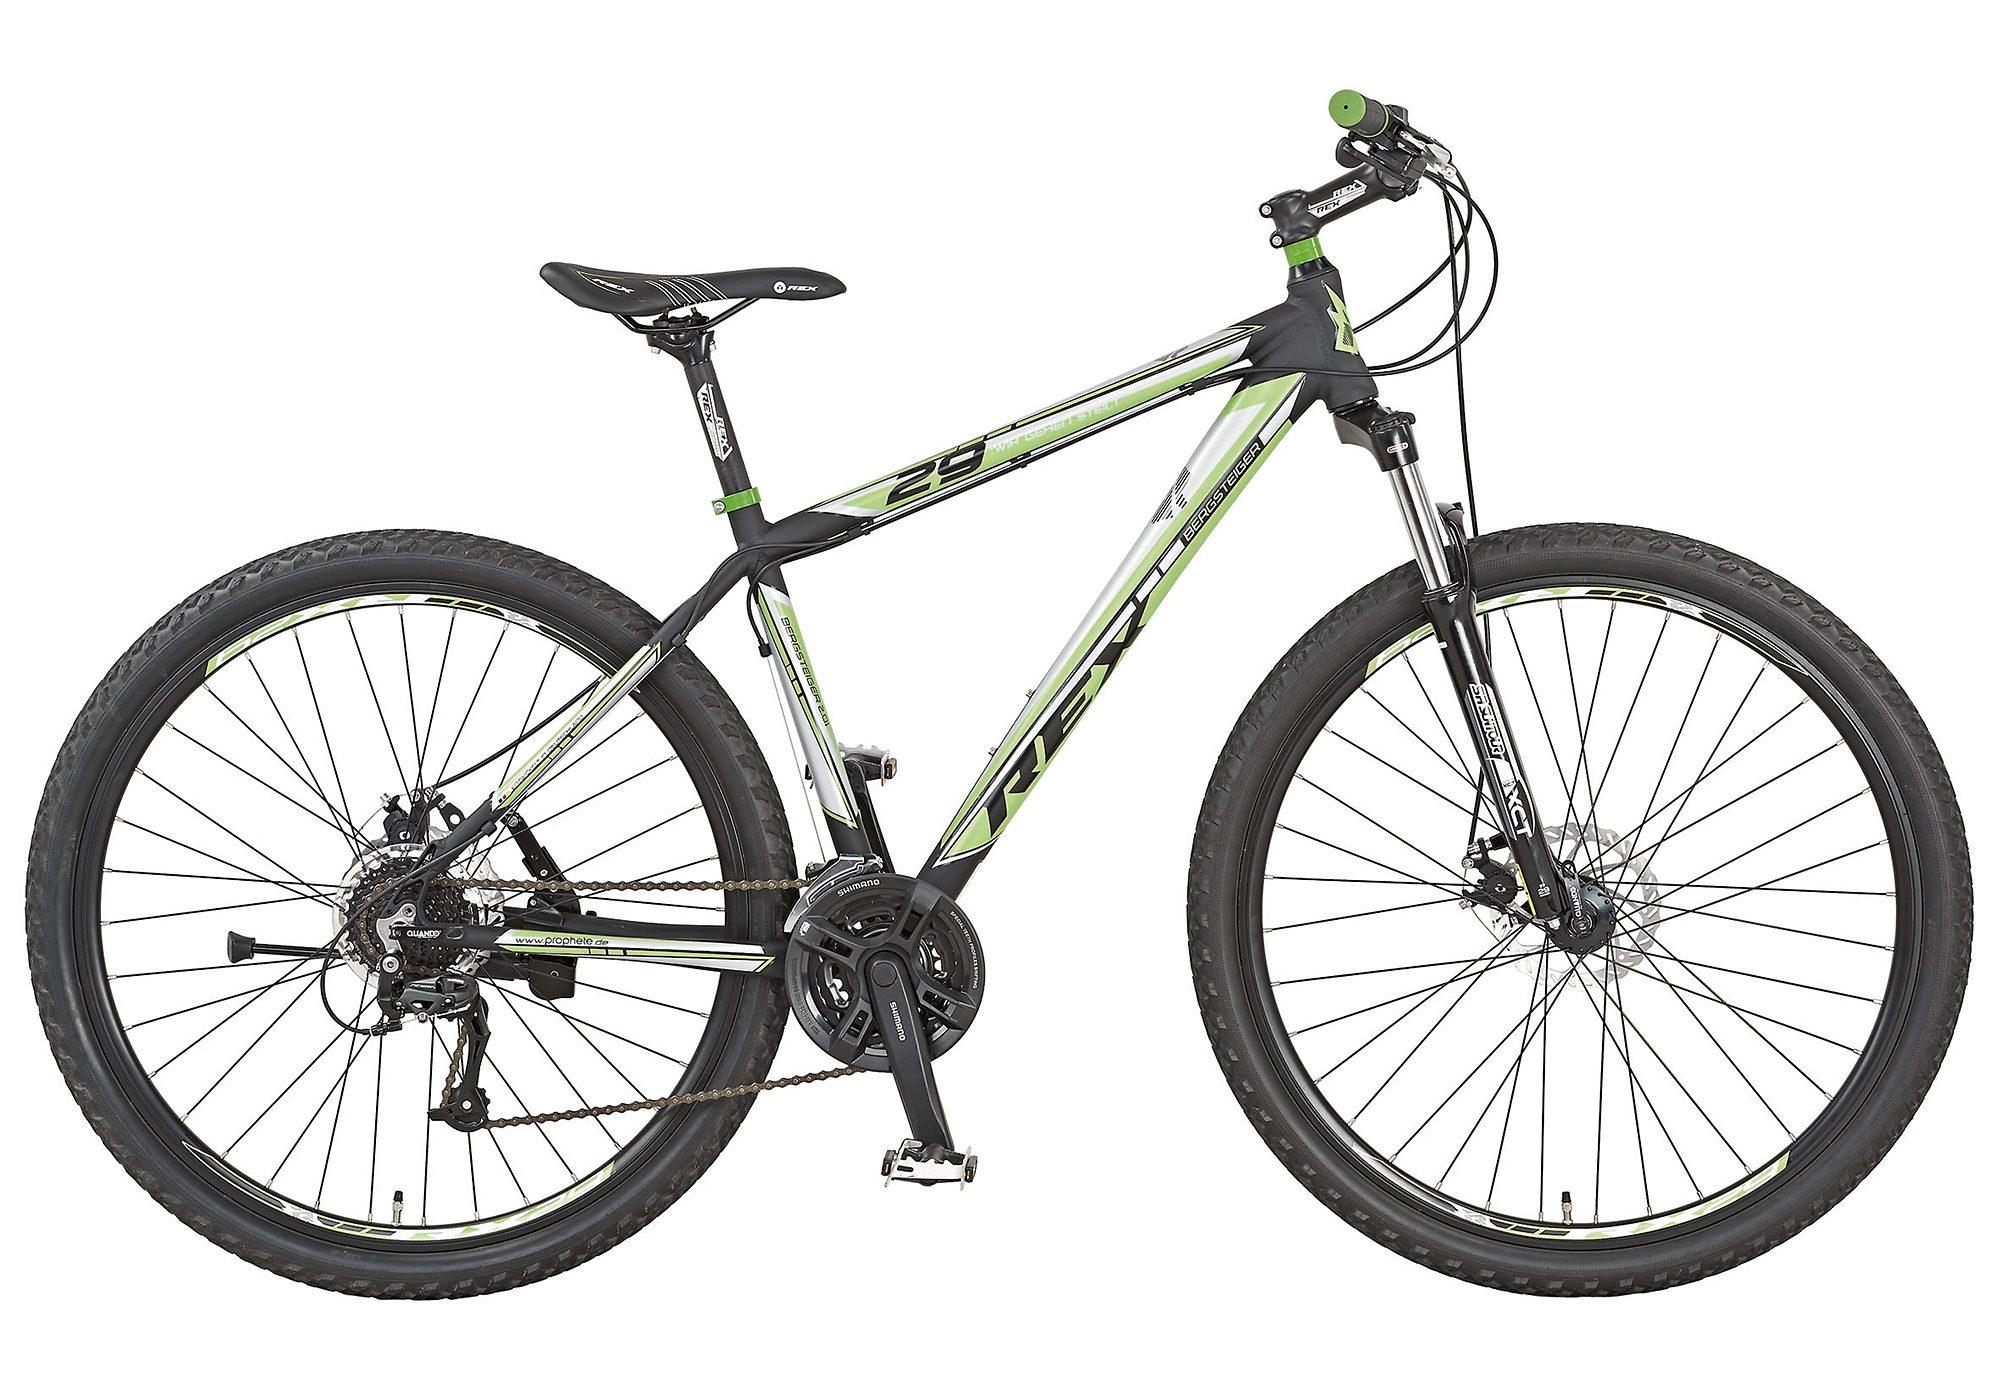 Alu Mountainbike Hardtail, 29 Zoll, 24 Gang Shimano Acera, »Twentyniner BERGSTEIGER 2.01«, REX